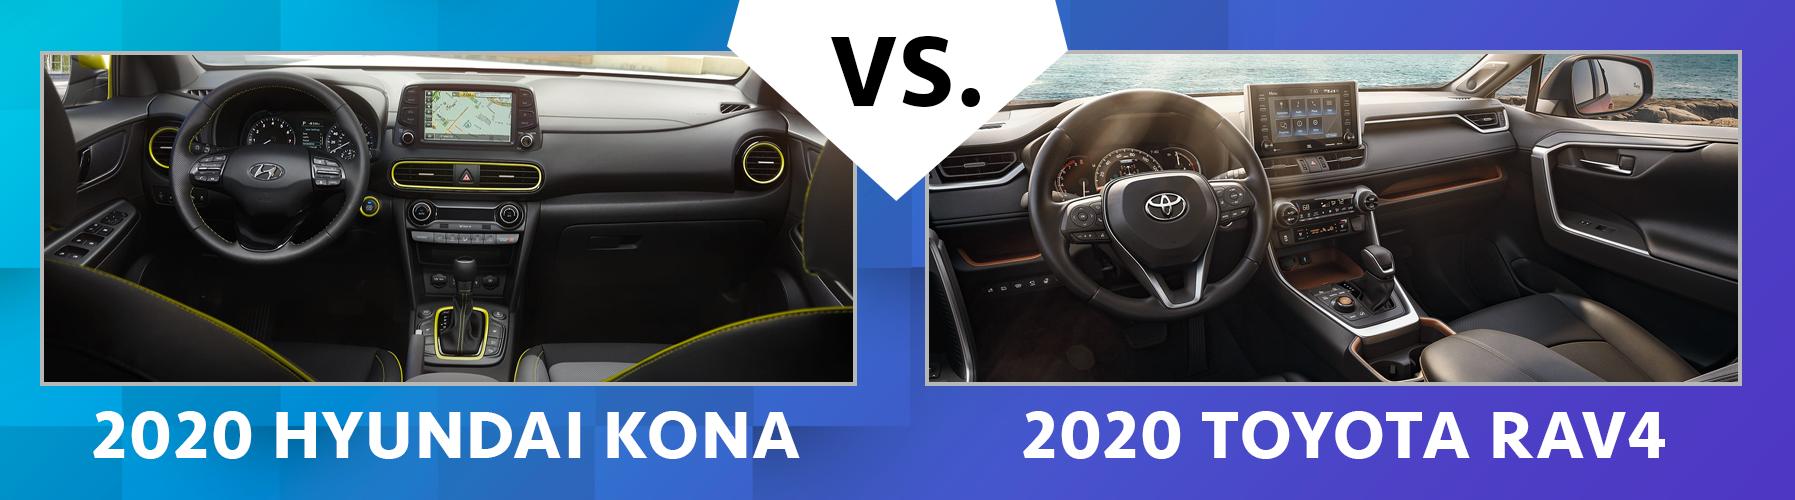 Compare 2020 Hyundai Kona vs 2020 Toyota RAV4